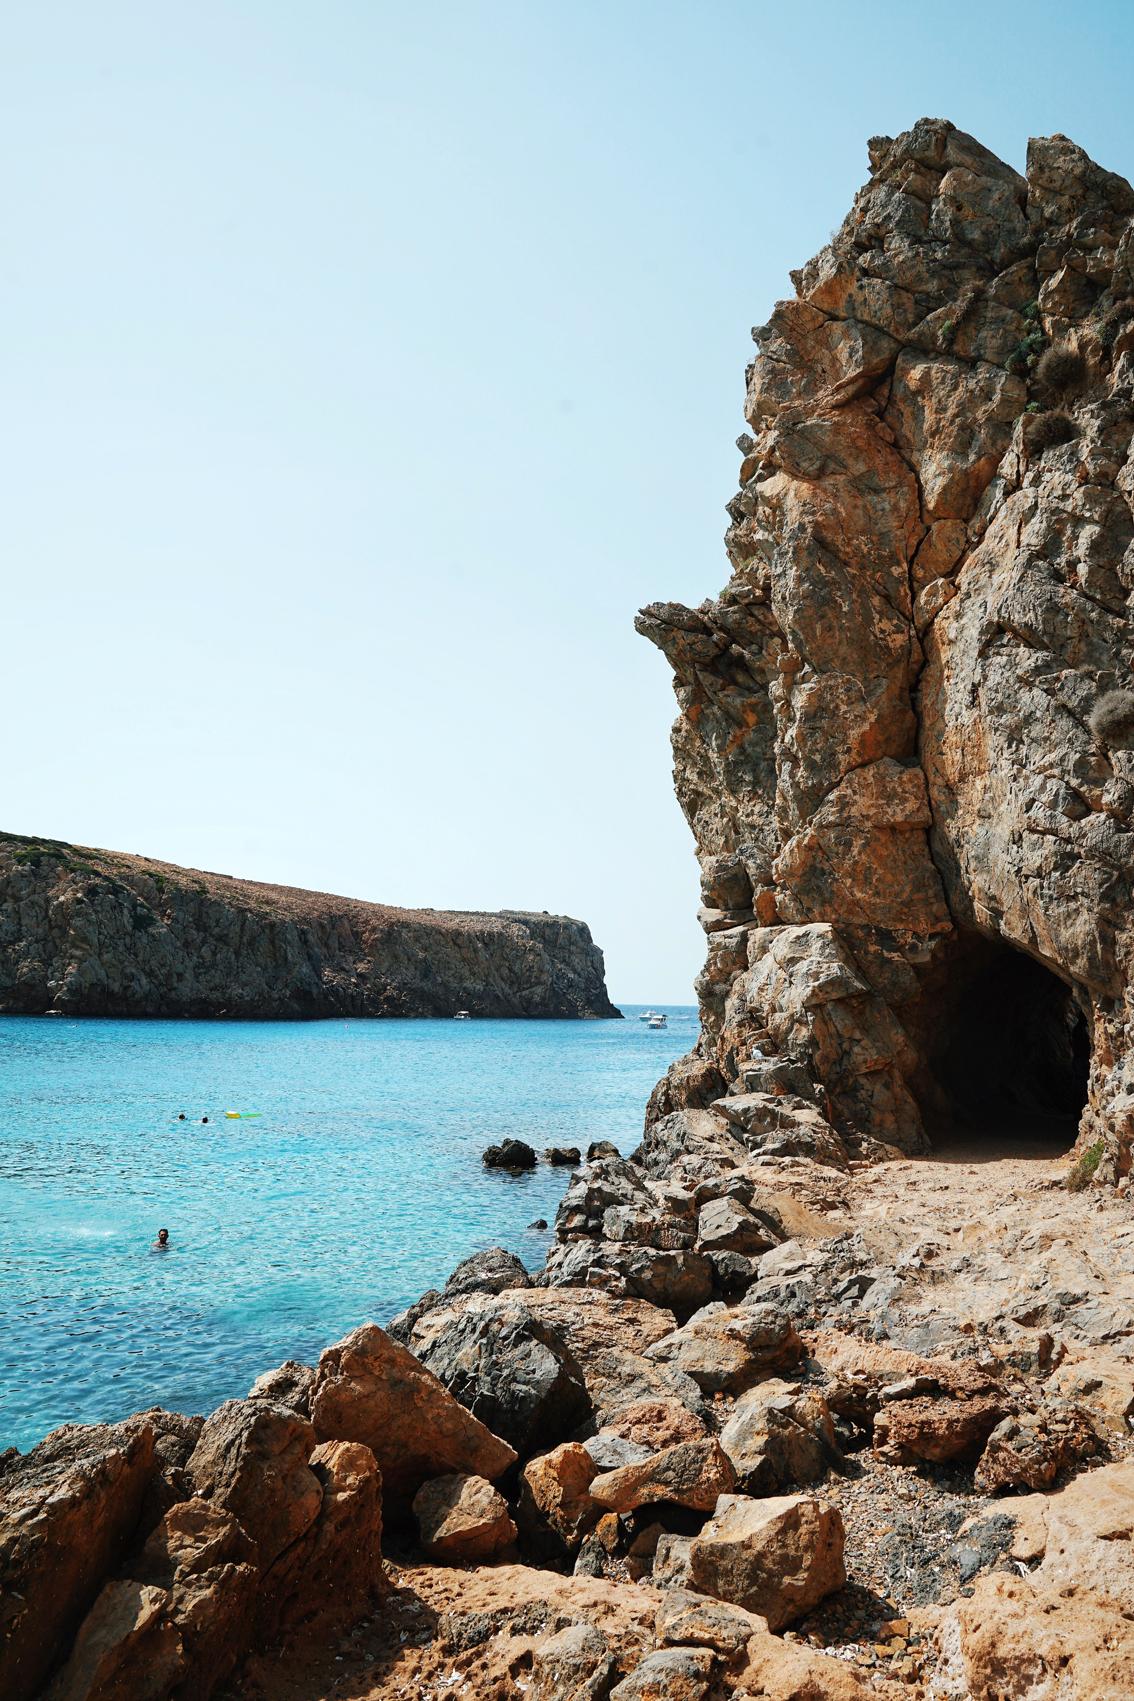 24 2 days in Cagliari ( Sardinia ), where to sleep to discover the best beaches.